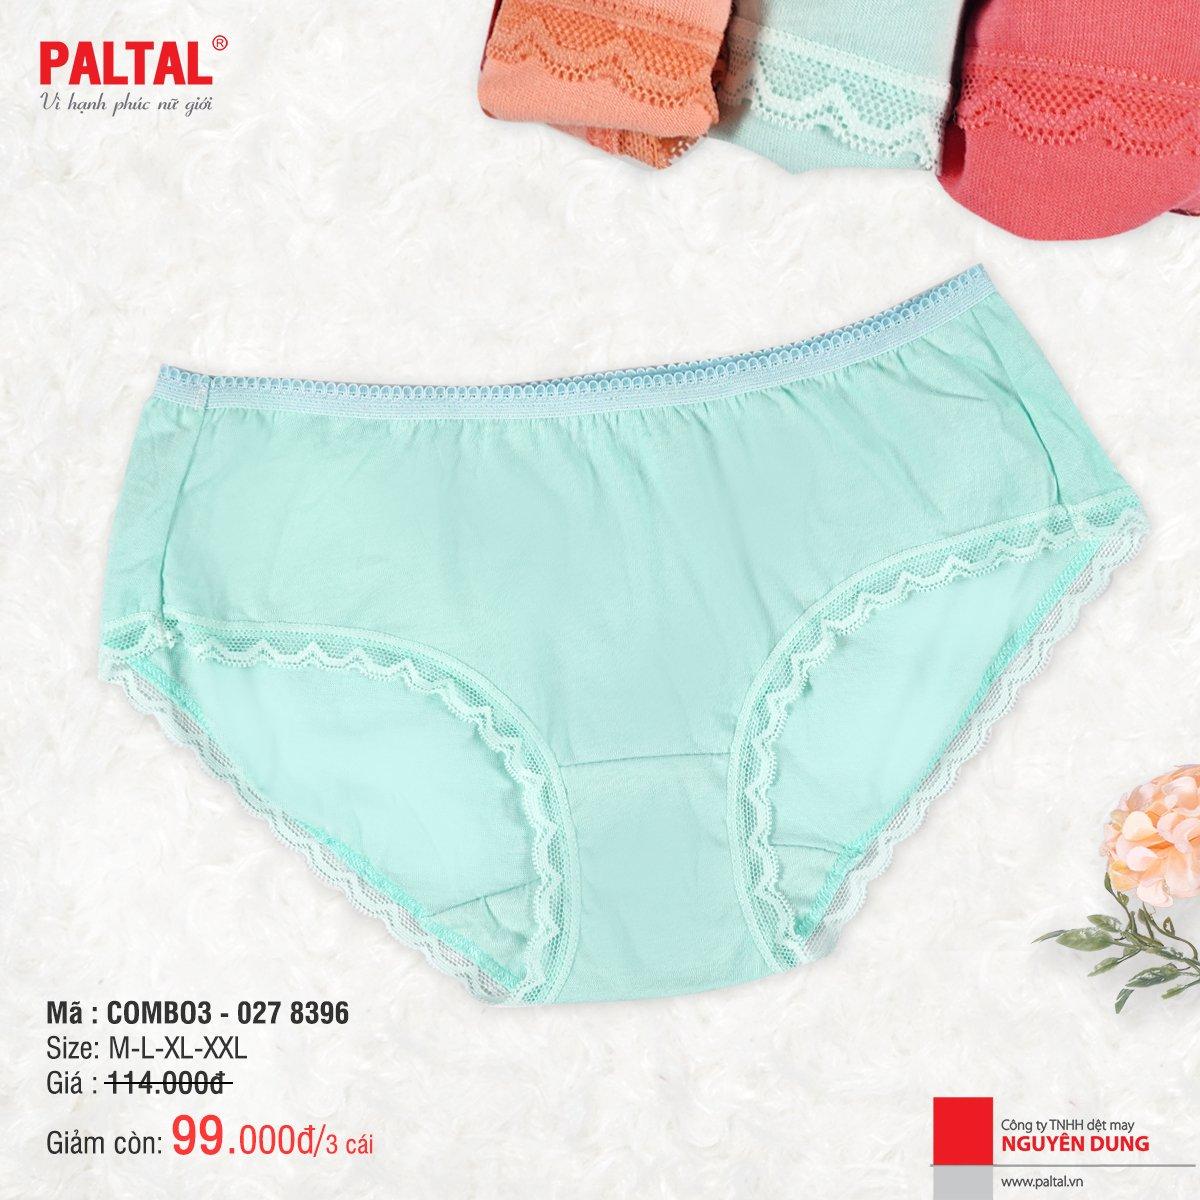 Combo 3 quần lót cao cấp paltal ql 027p 8396